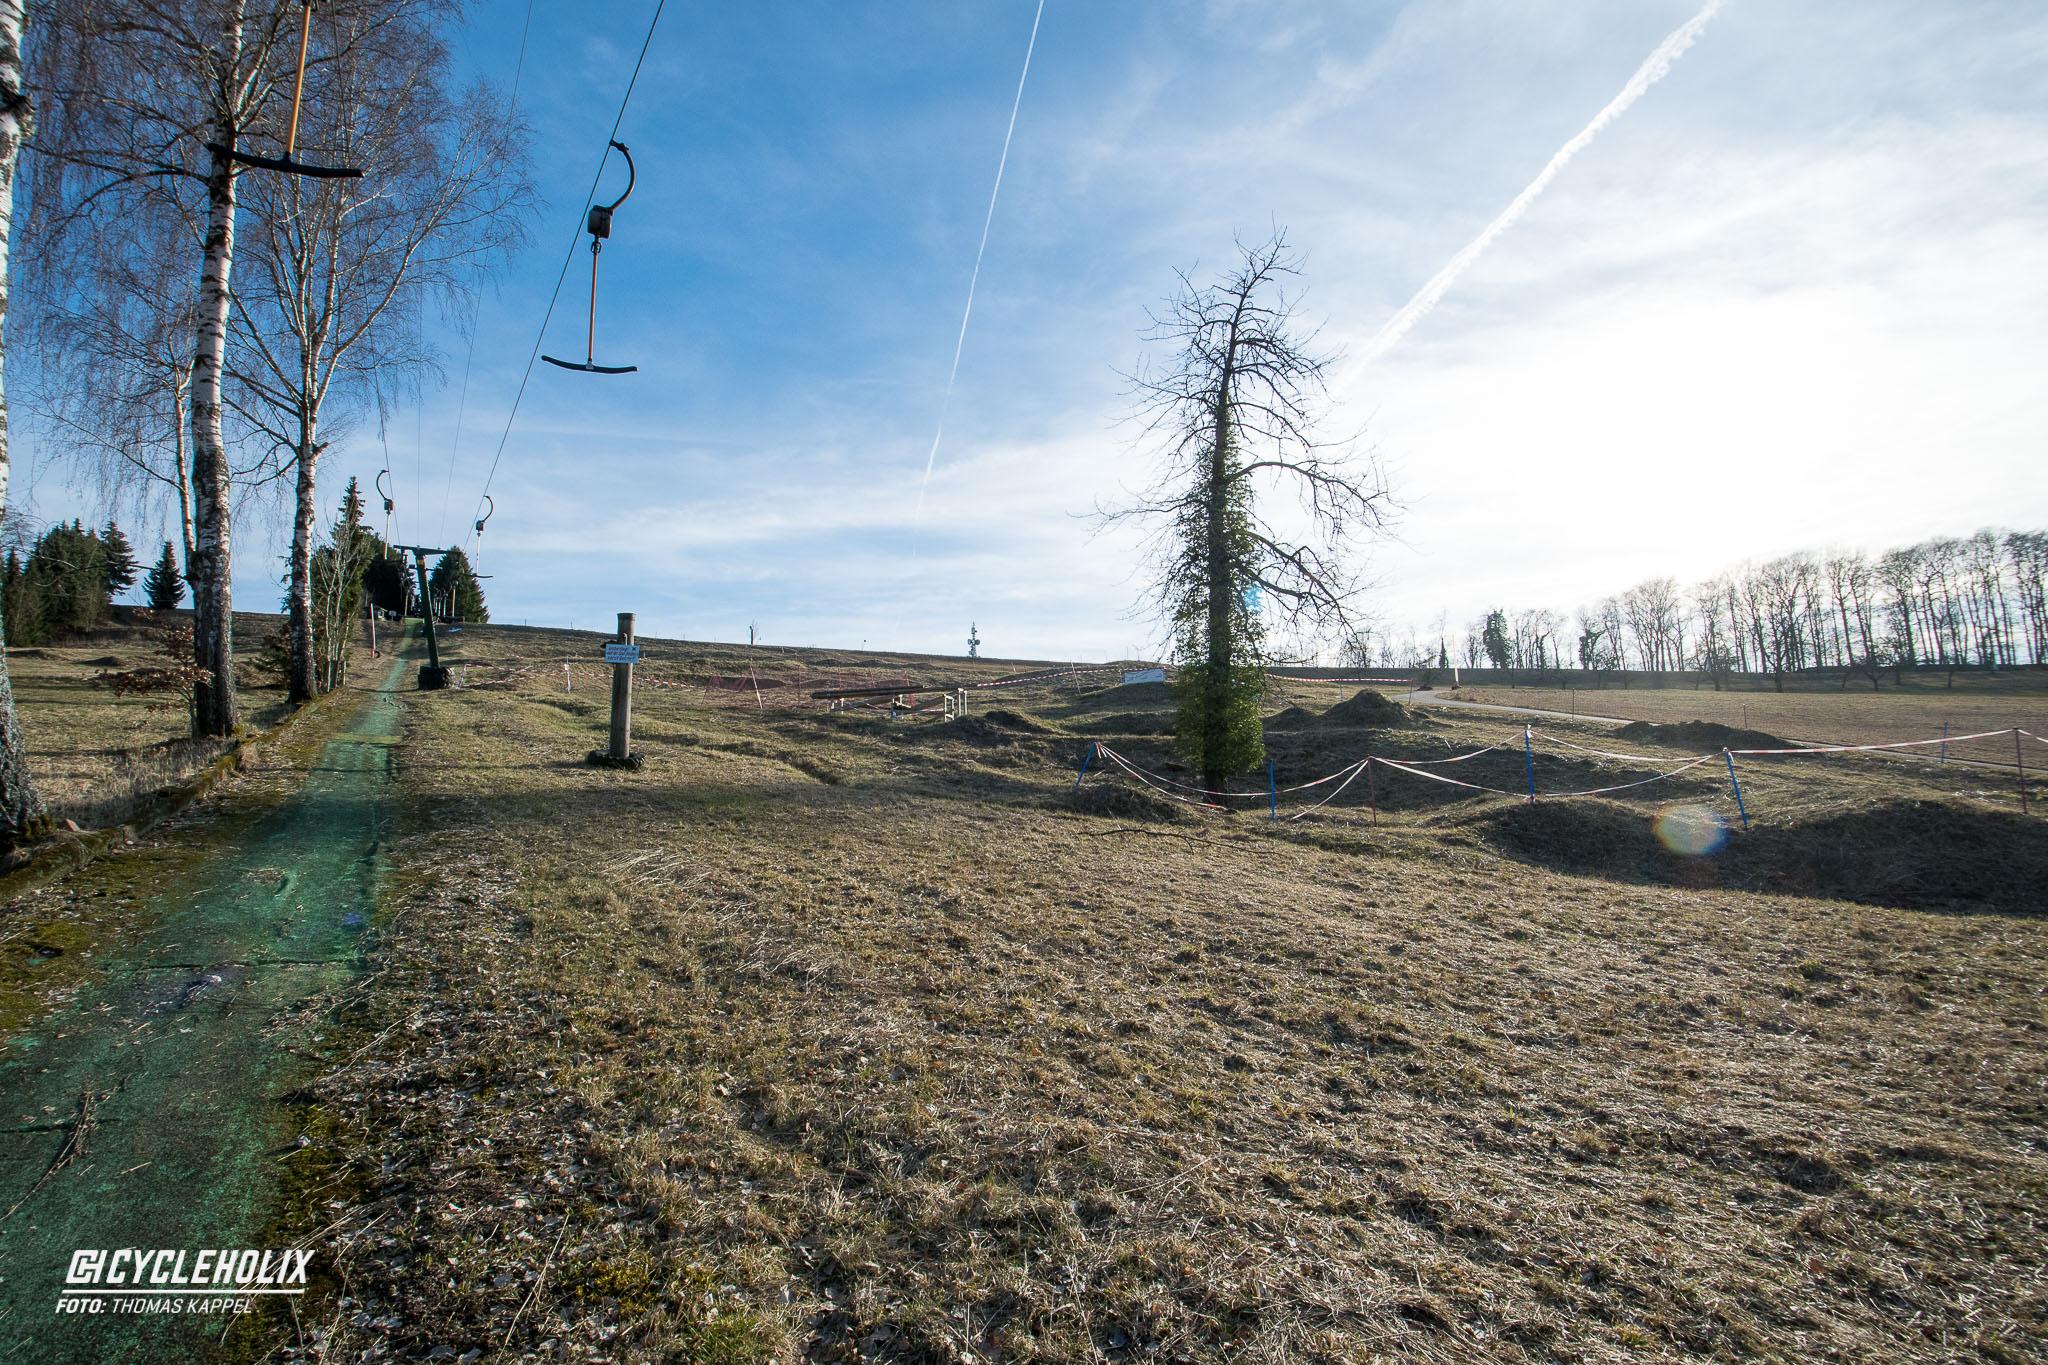 2019 Bikepark Großerlach 2 Cycleholix